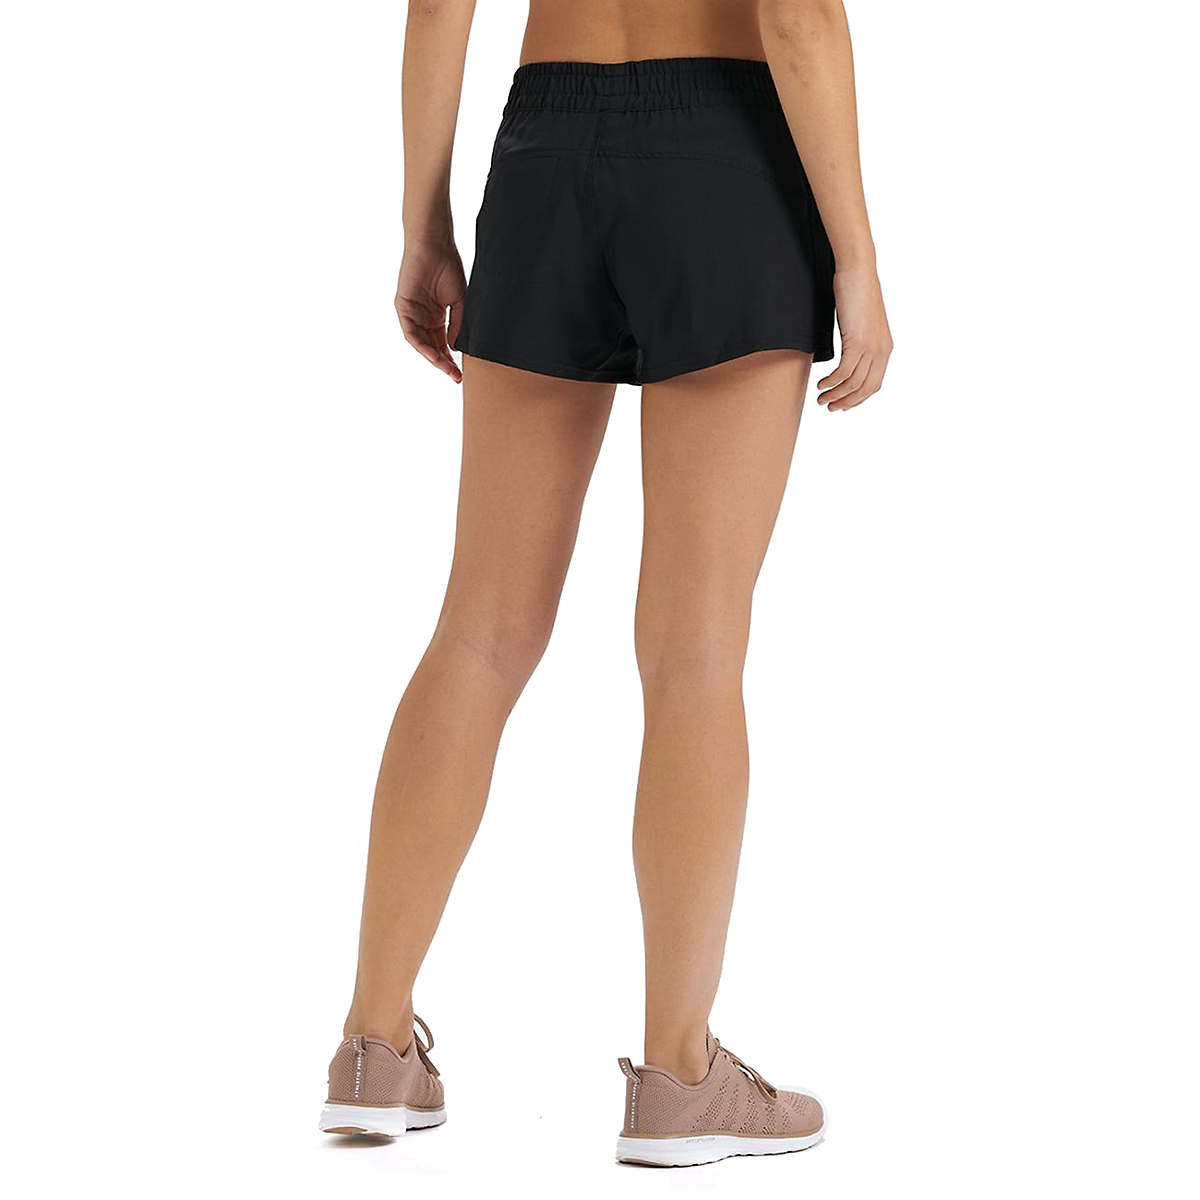 Women's Vuori Dash Short  - Color: Black - Size: XS, Black, large, image 3